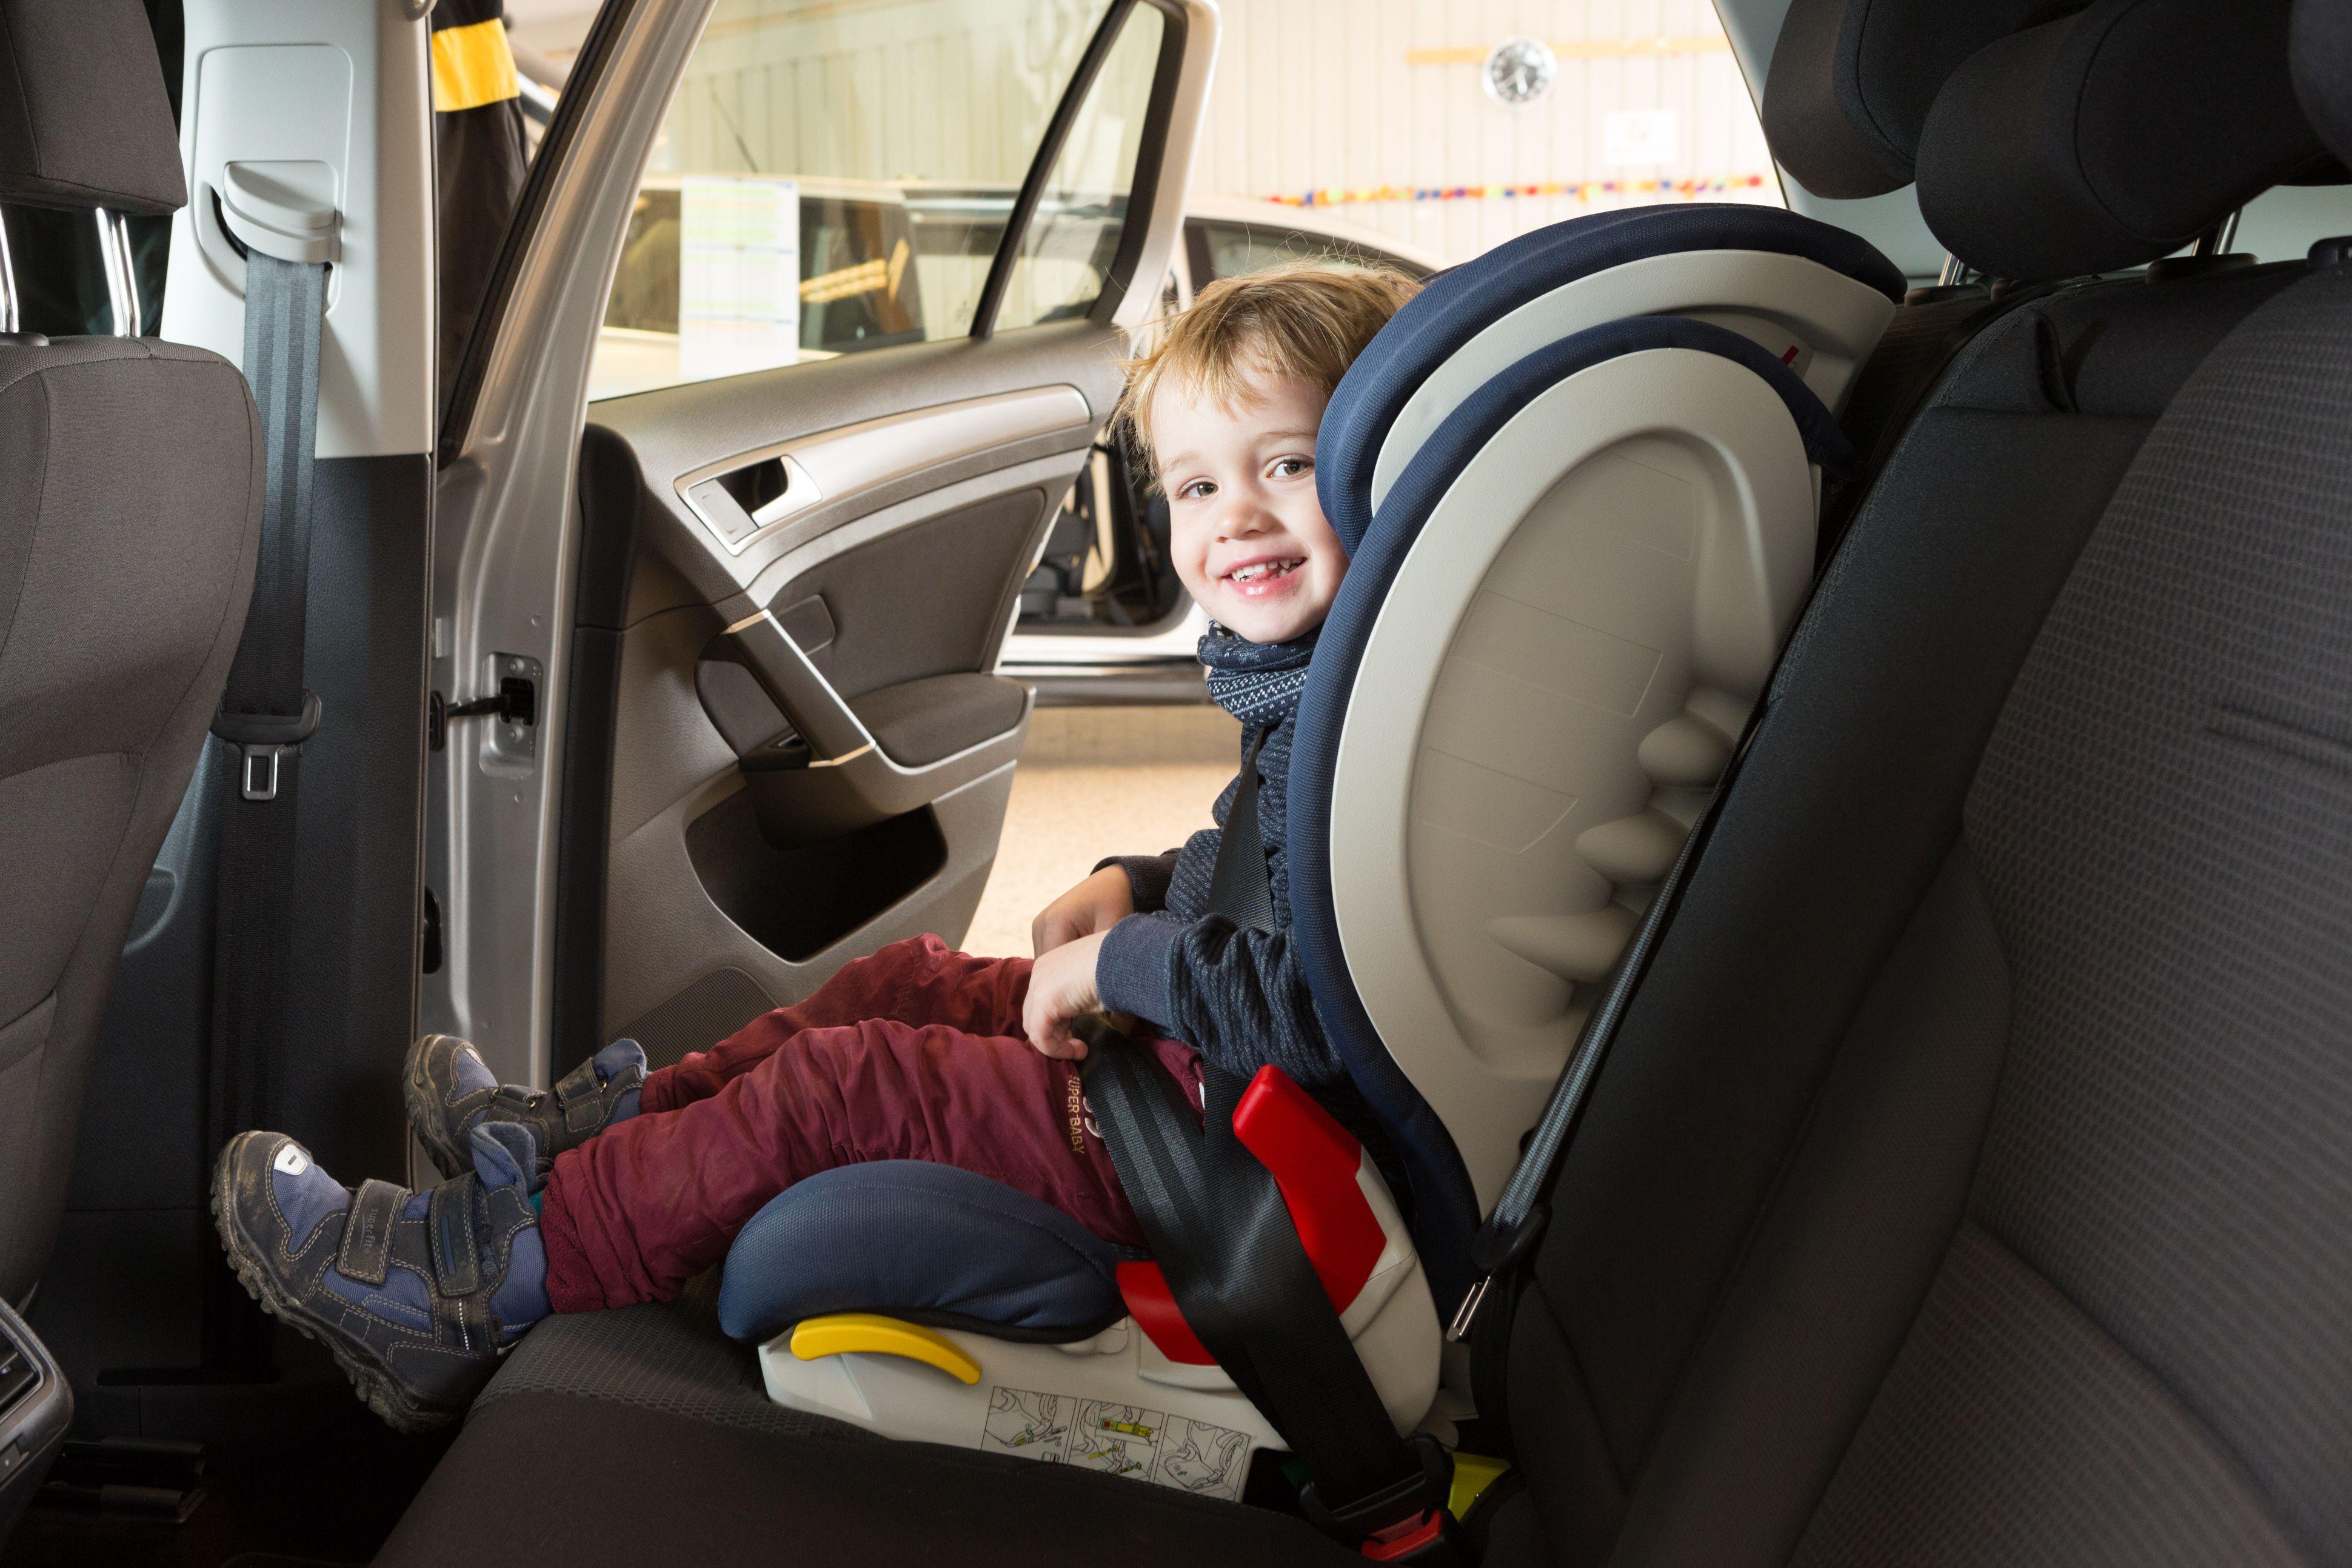 reveals latest Best Buy car seats